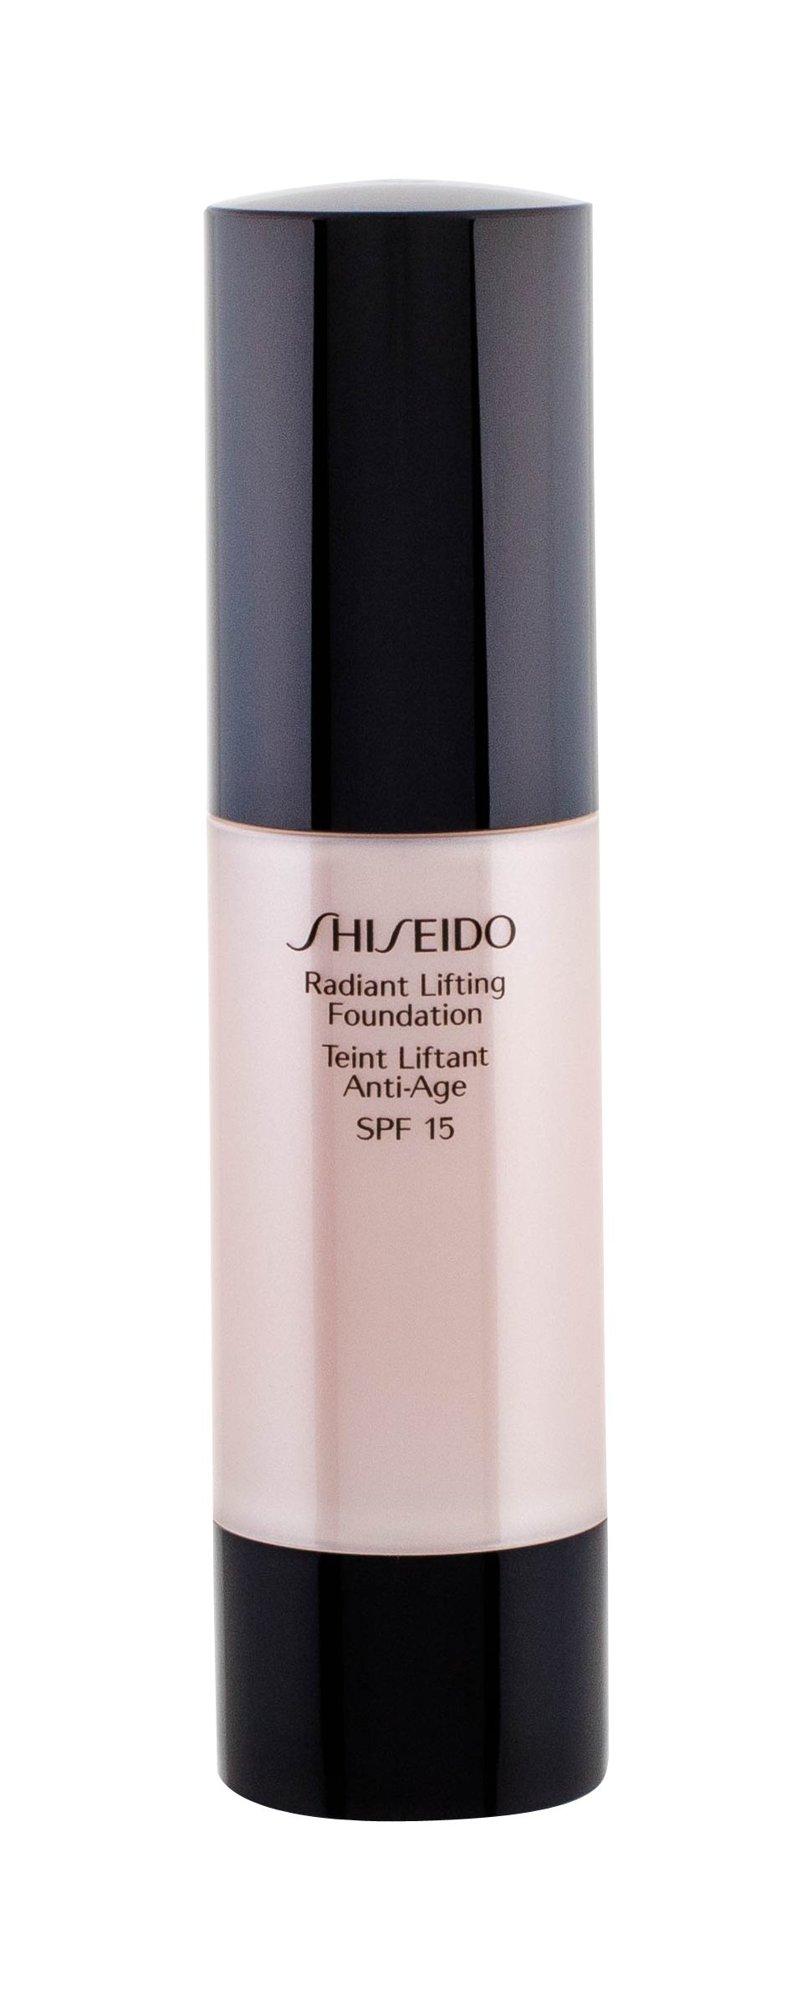 Shiseido Radiant Lifting Foundation Makeup 30ml B40 Natural Fair Beige